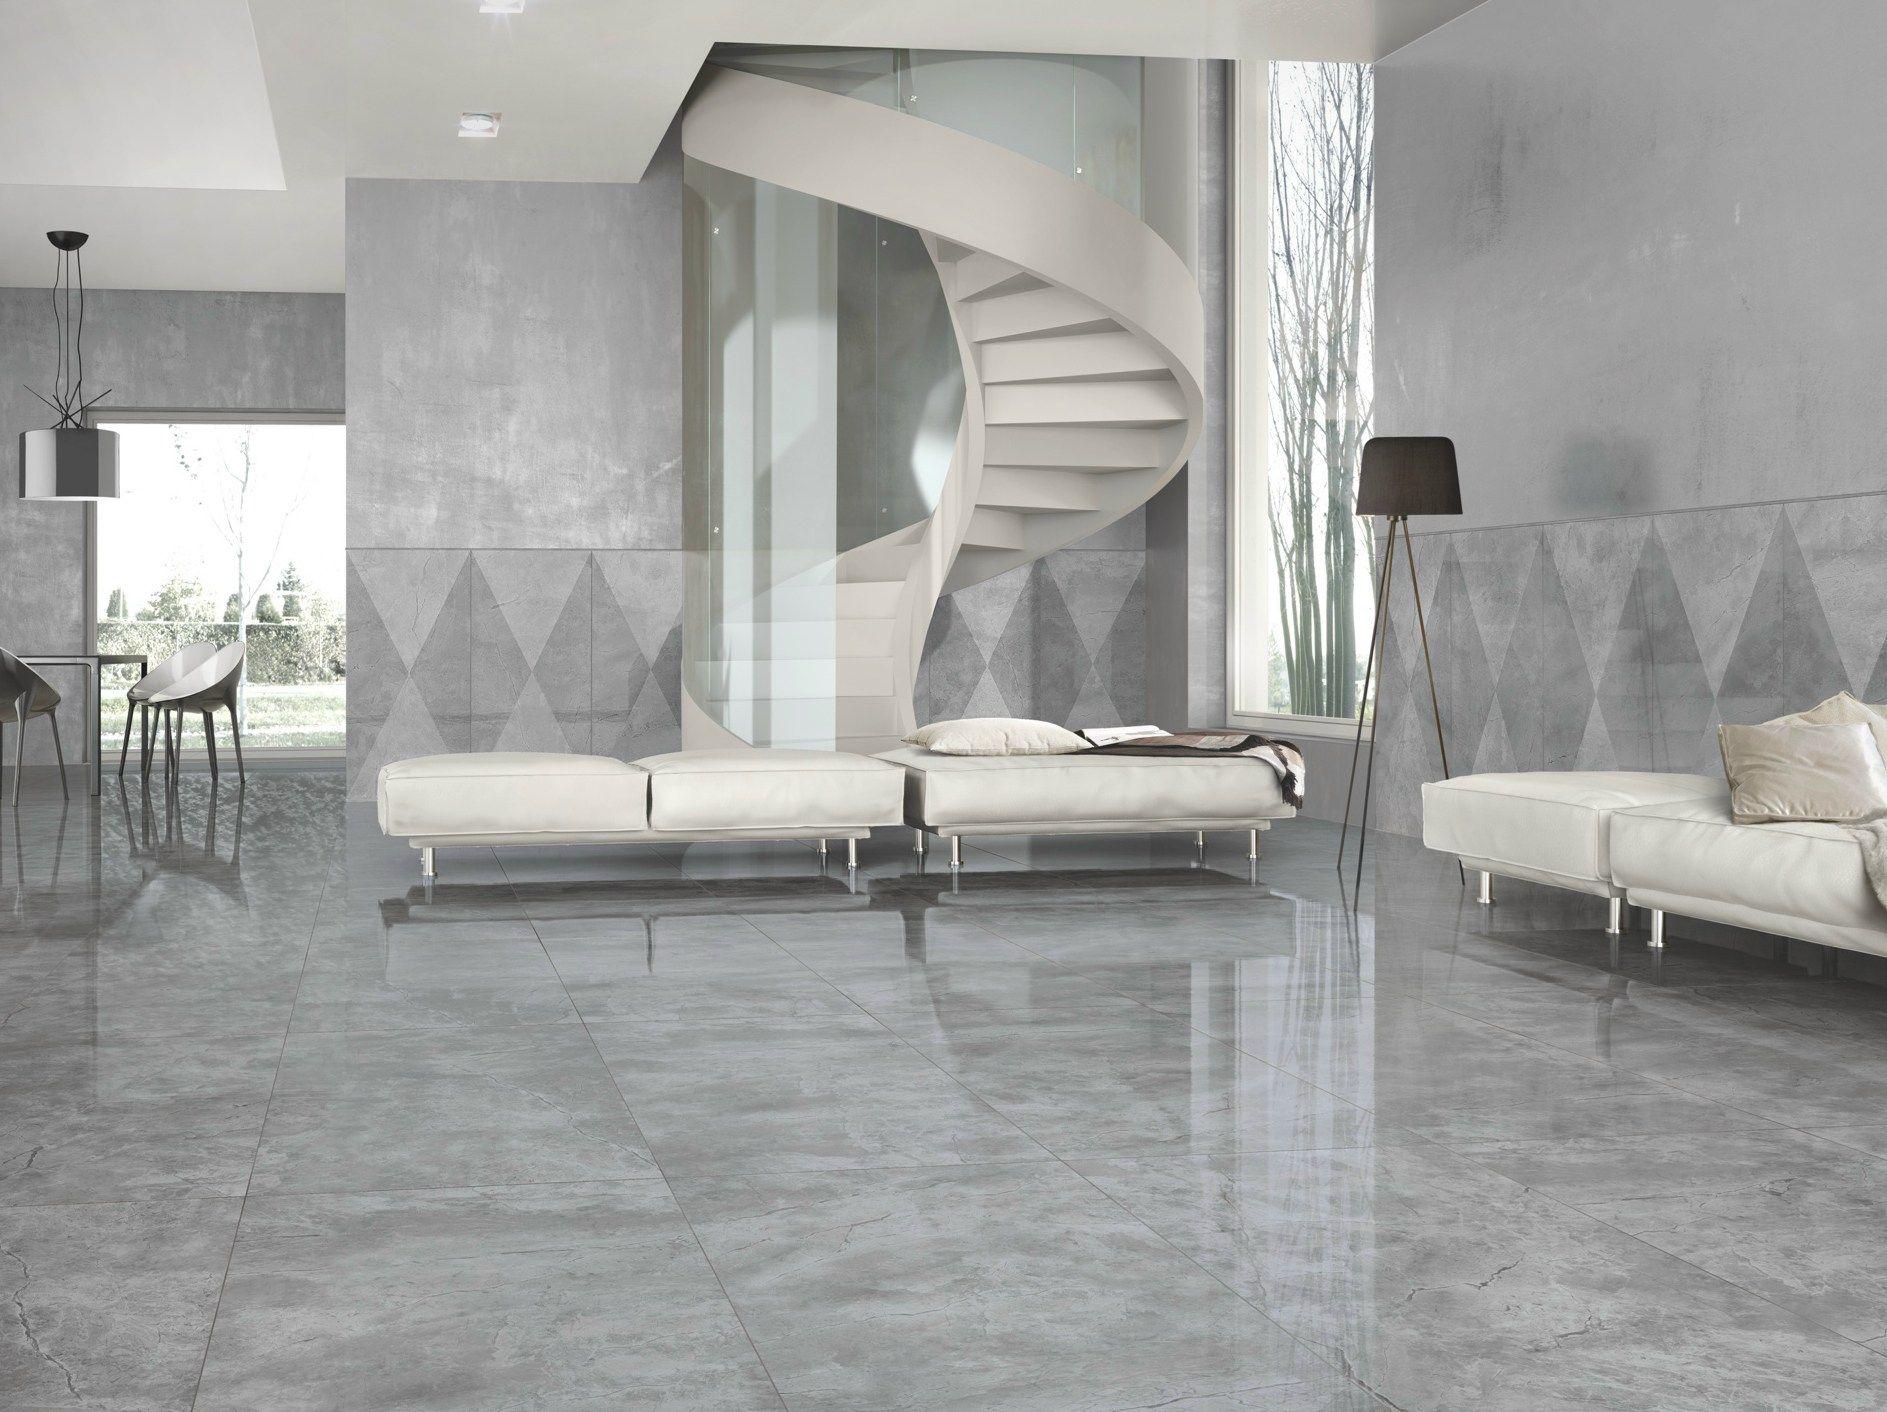 Porcelain stoneware wall floor tiles with marble effect for Interieur maison carrelage gris